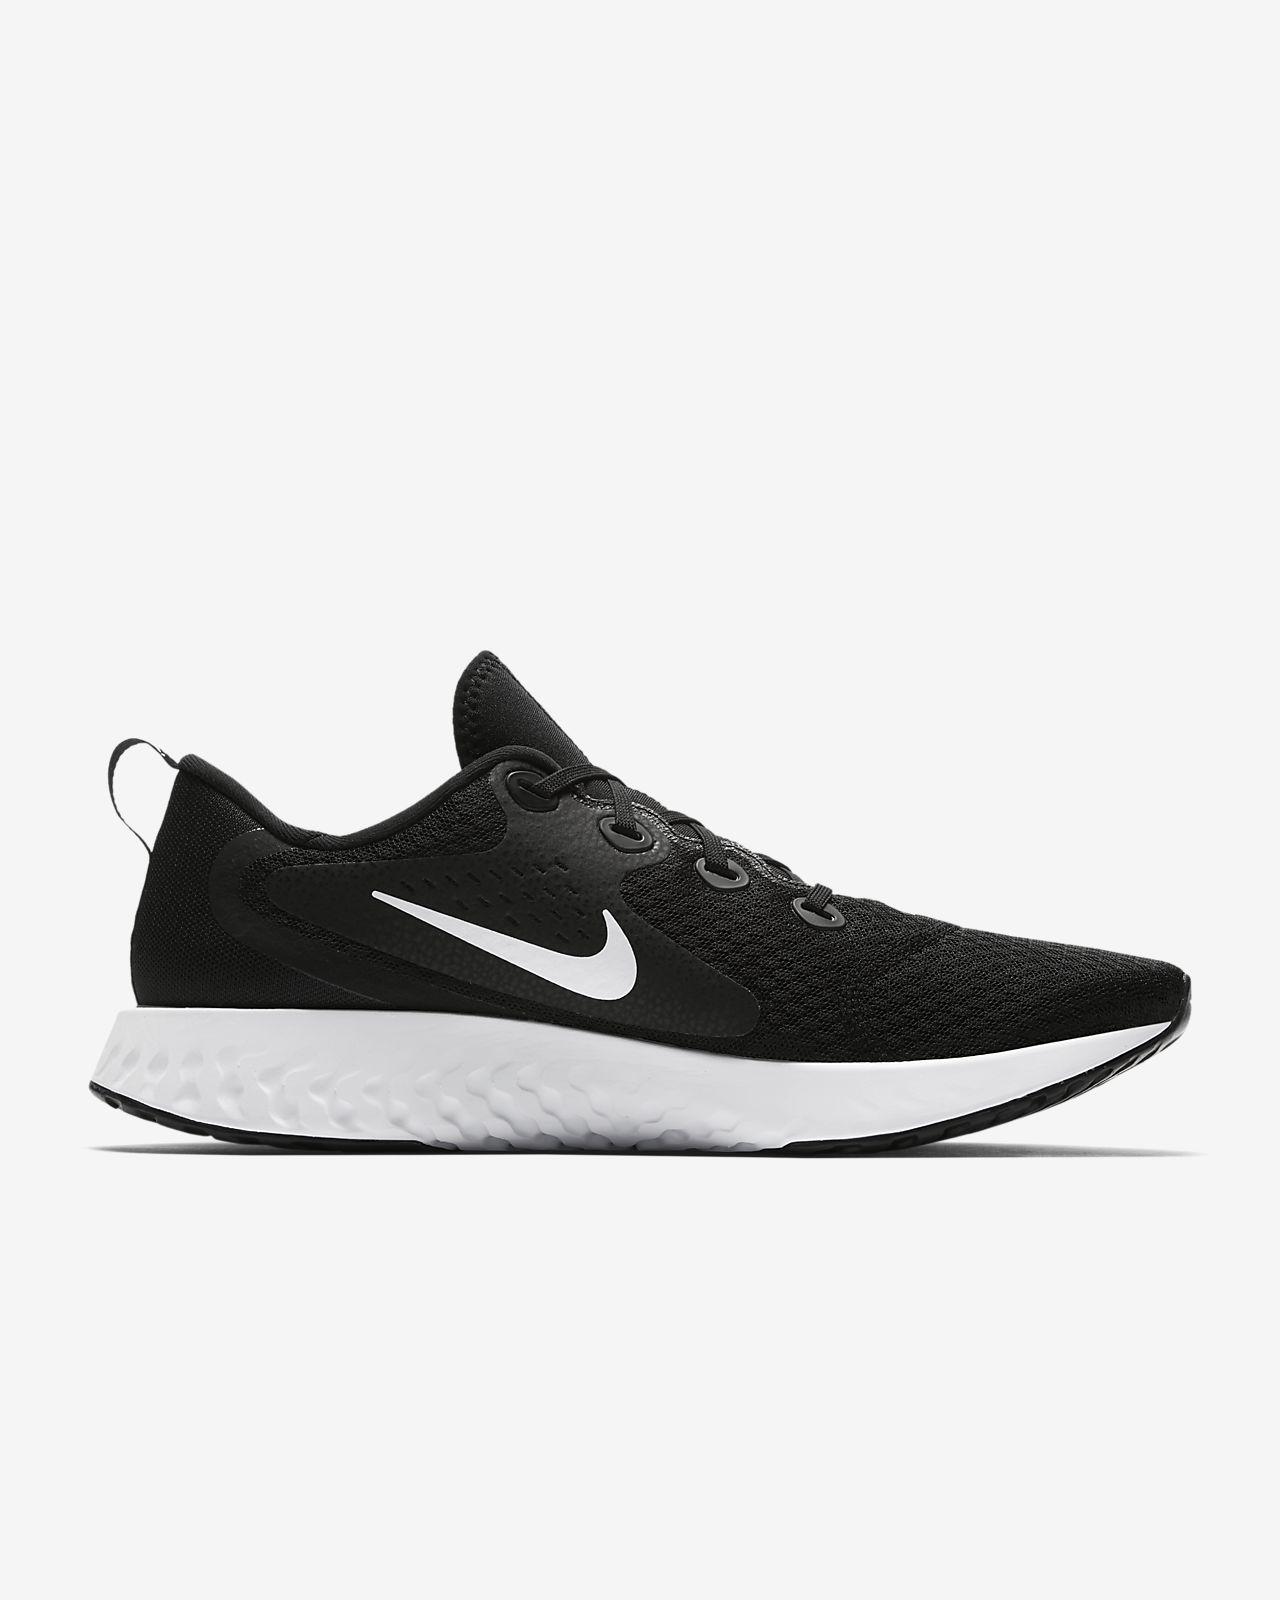 Low Resolution Nike Legend React Men s Running Shoe Nike Legend React Men s  Running Shoe 301bd8220